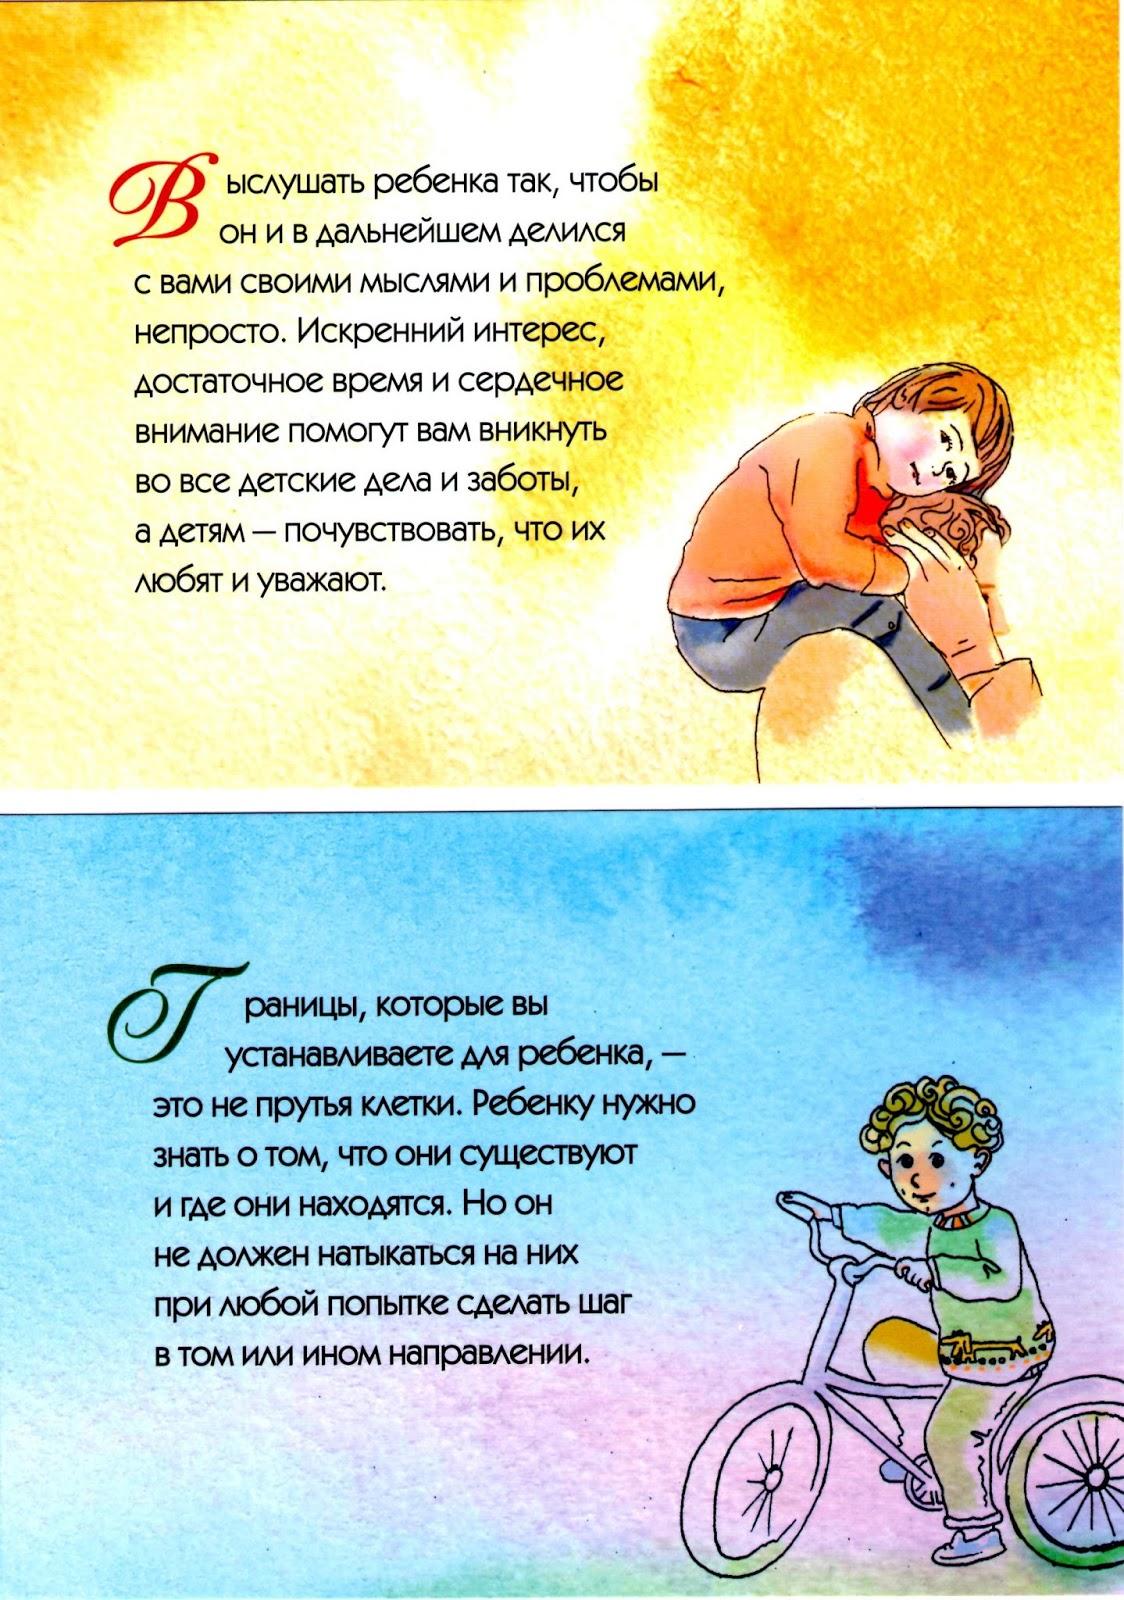 Стихотворение про родителей картинка